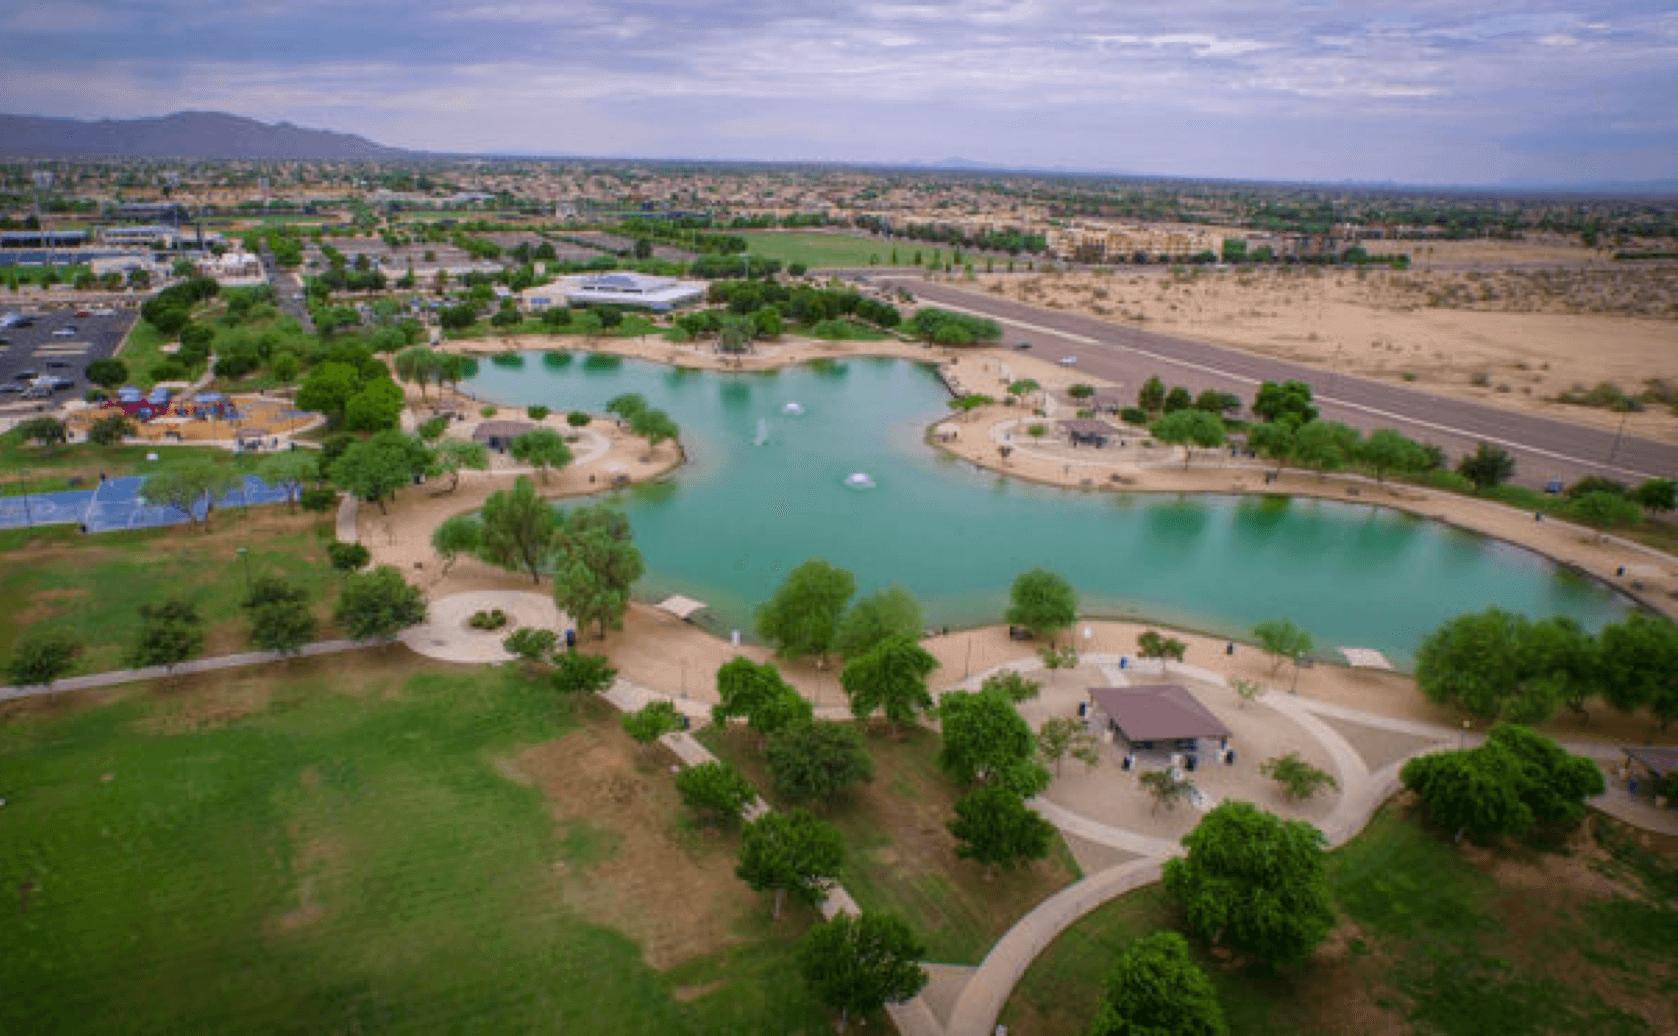 Surprise-Community-Lake-Fishing-Guide-Peoria-AZ-04